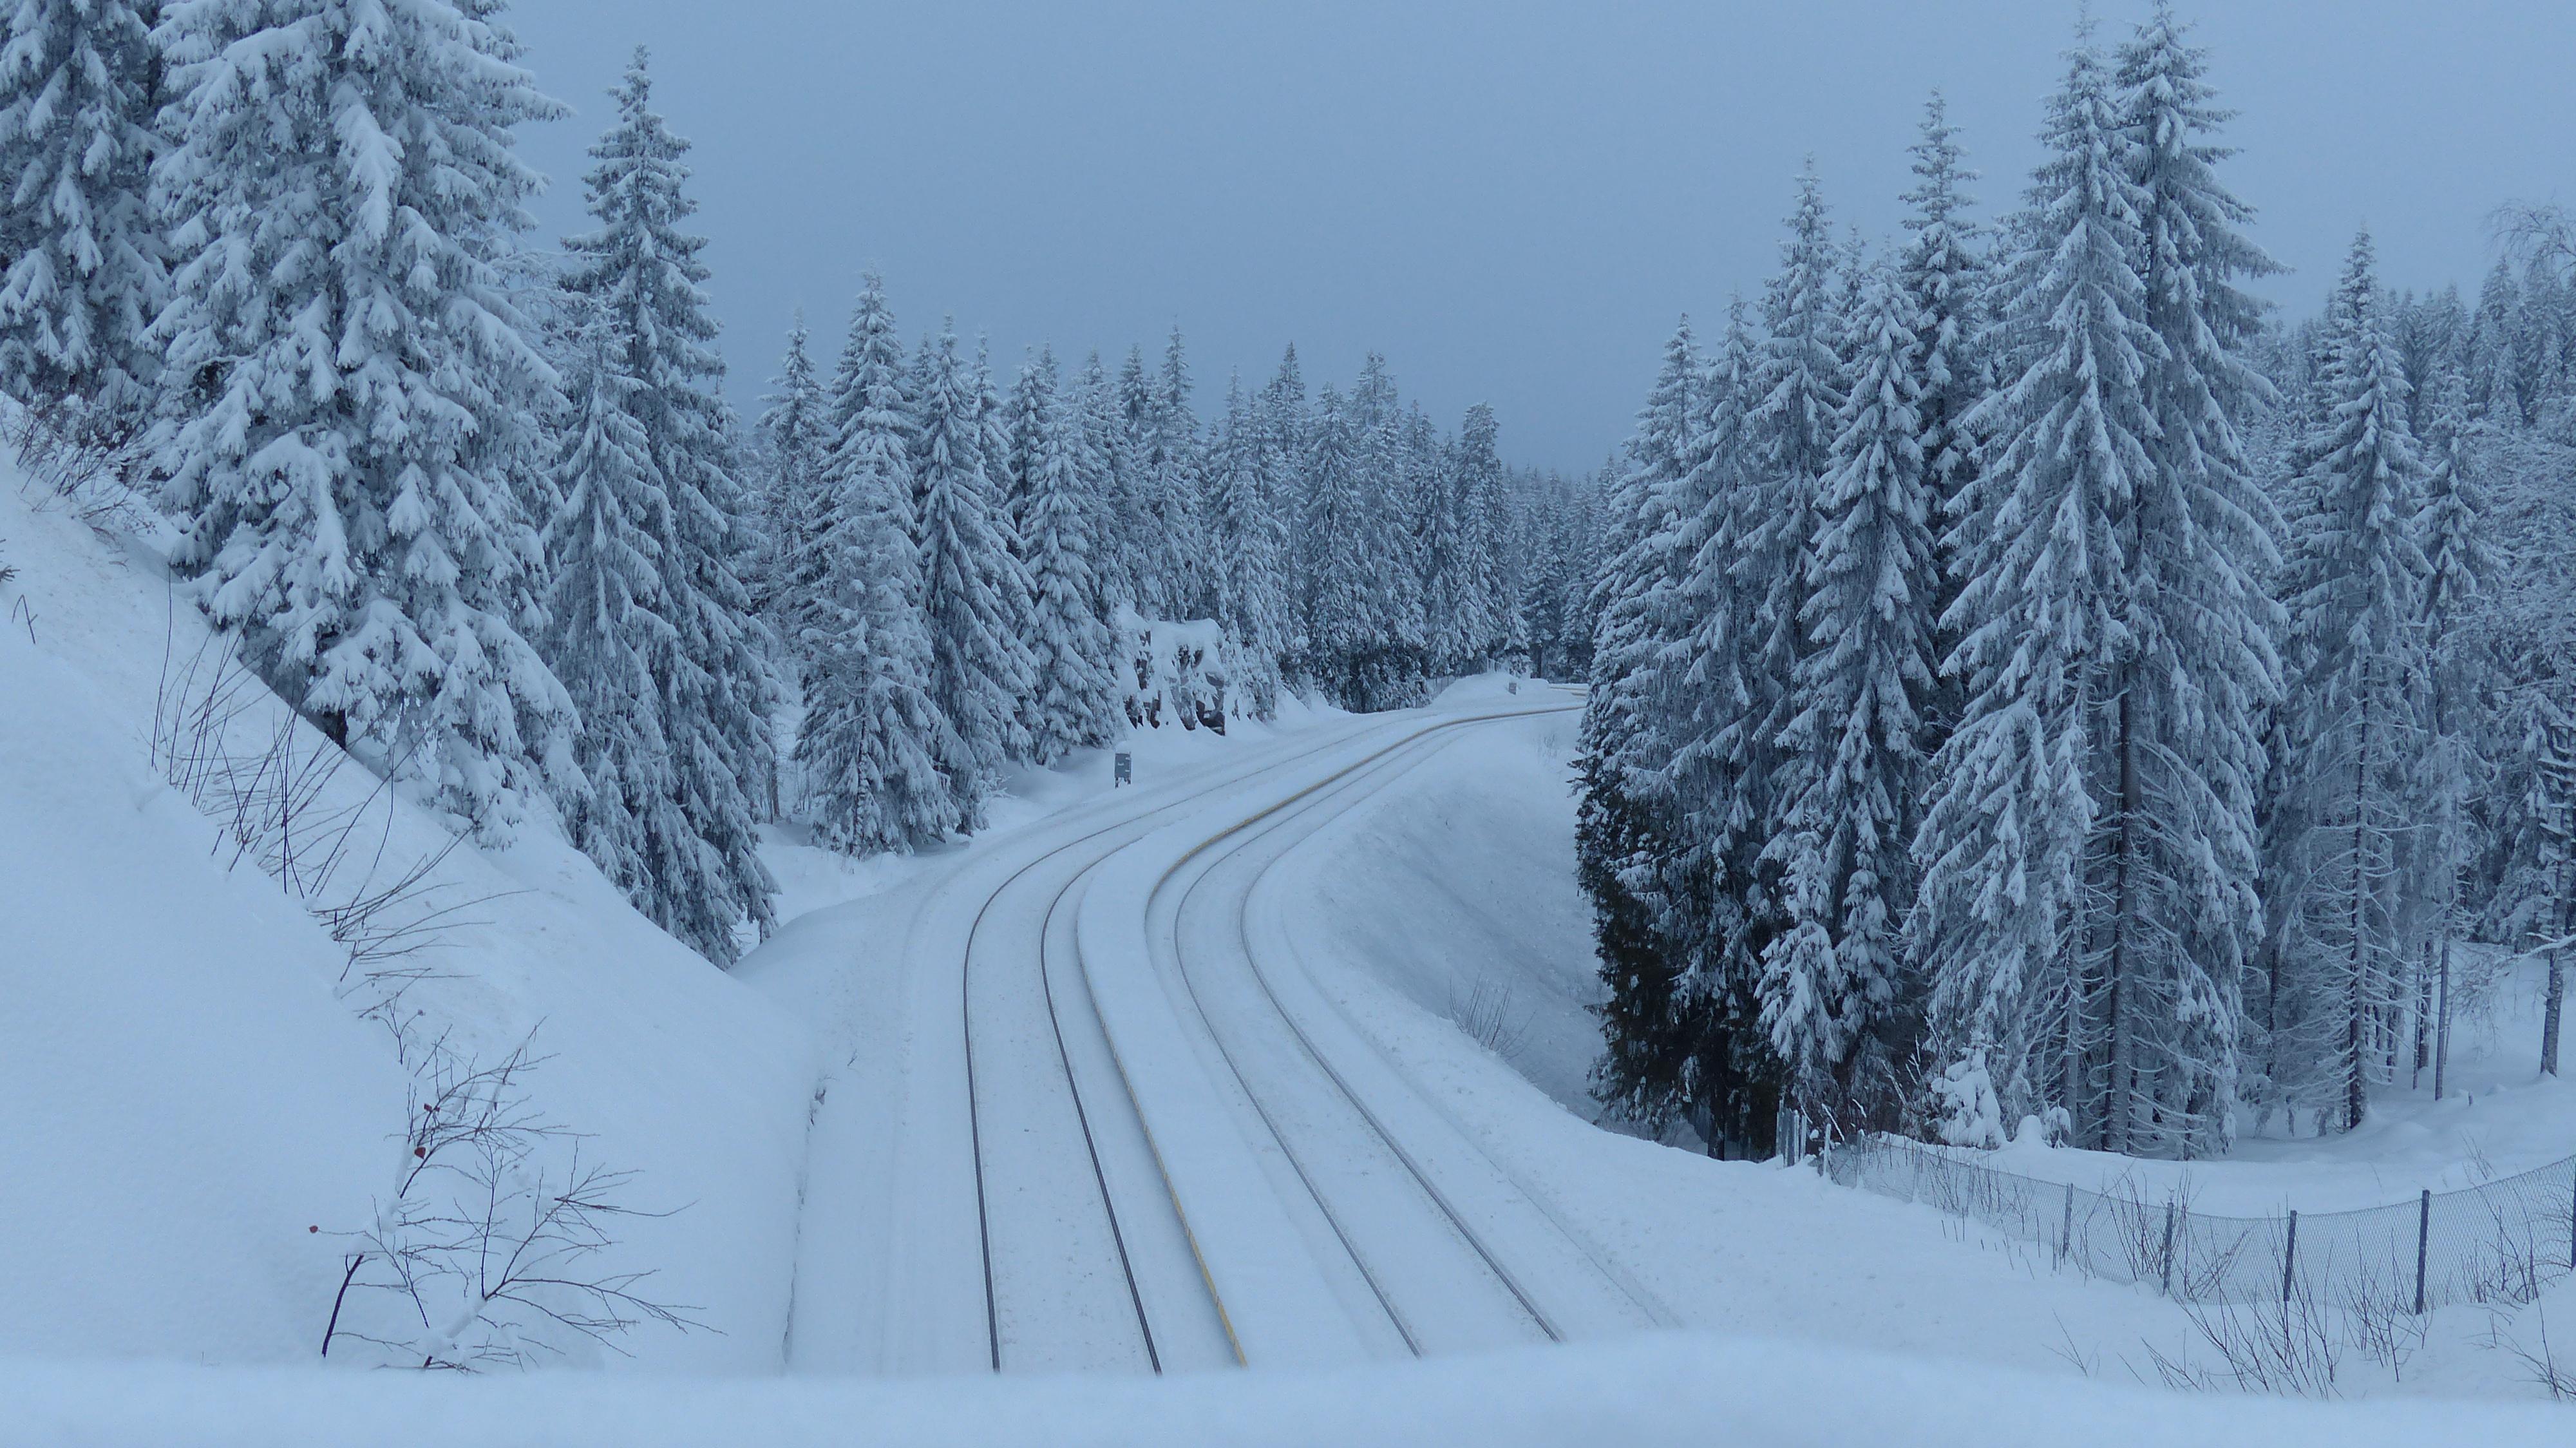 snow on the ground in jan? - Oslo Forum - TripAdvisor